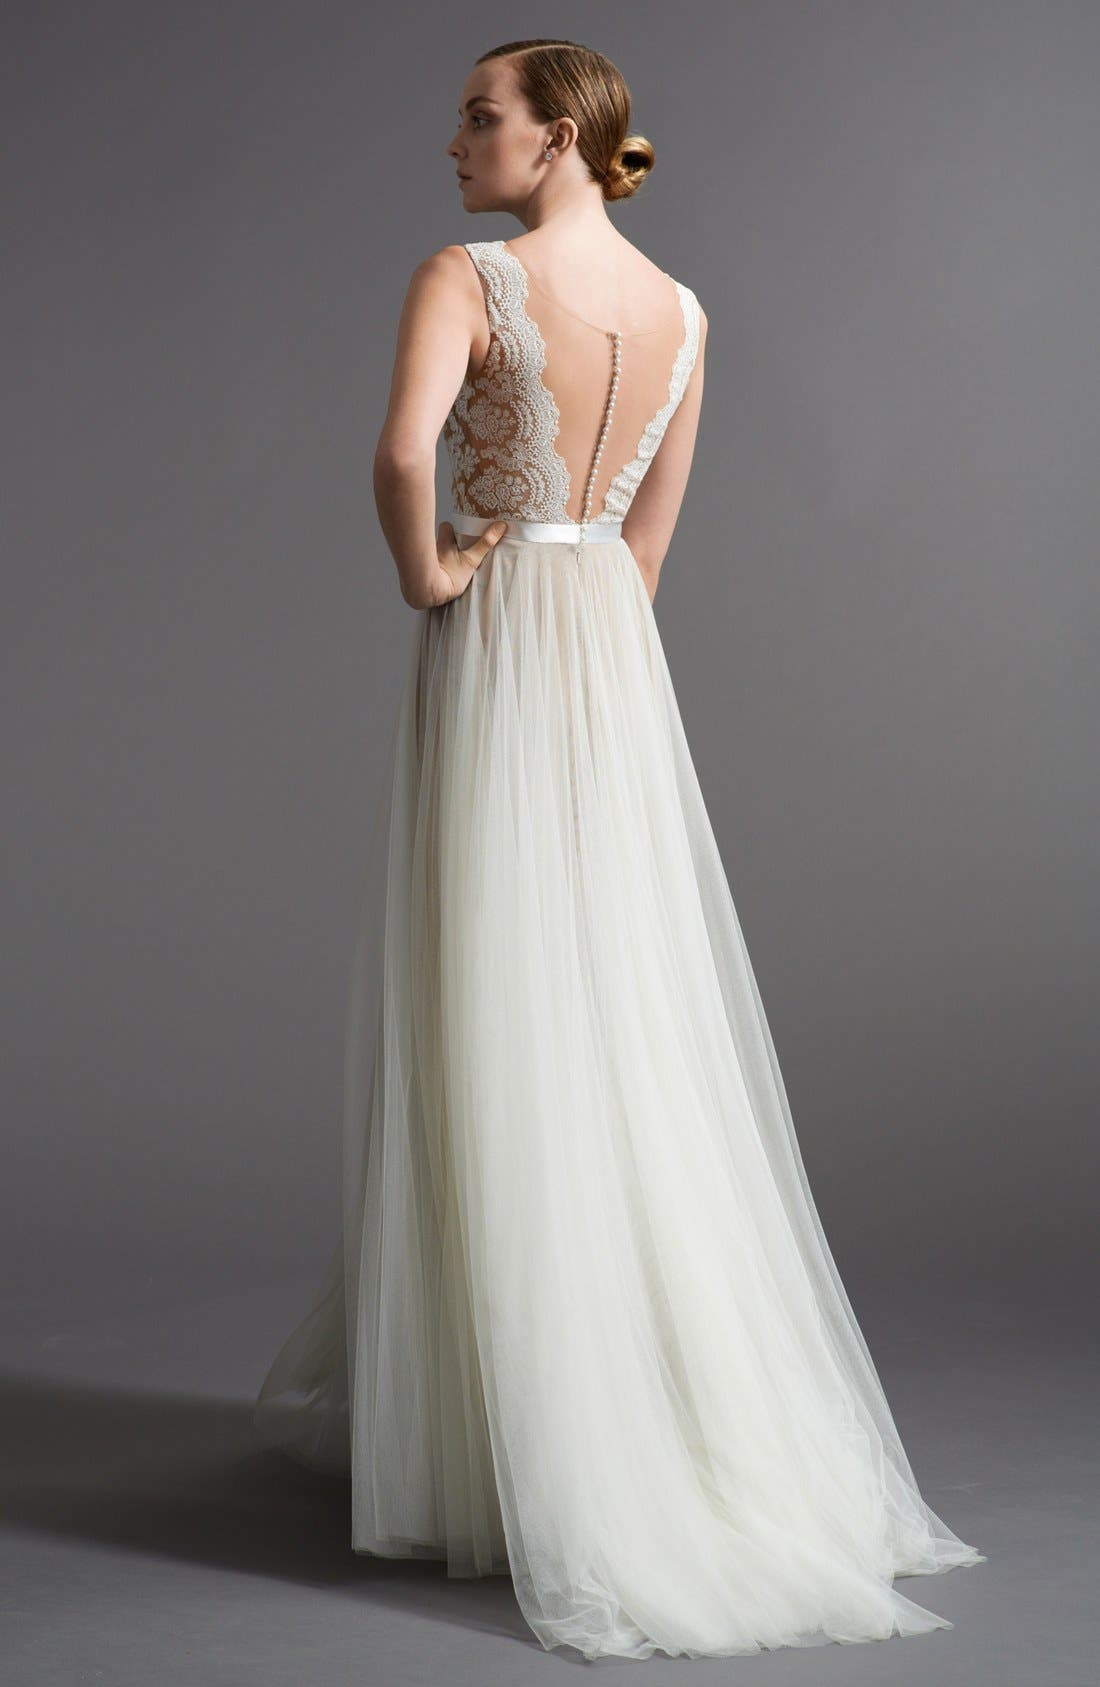 Boho Wedding Dresses & Bridal Gowns   Nordstrom